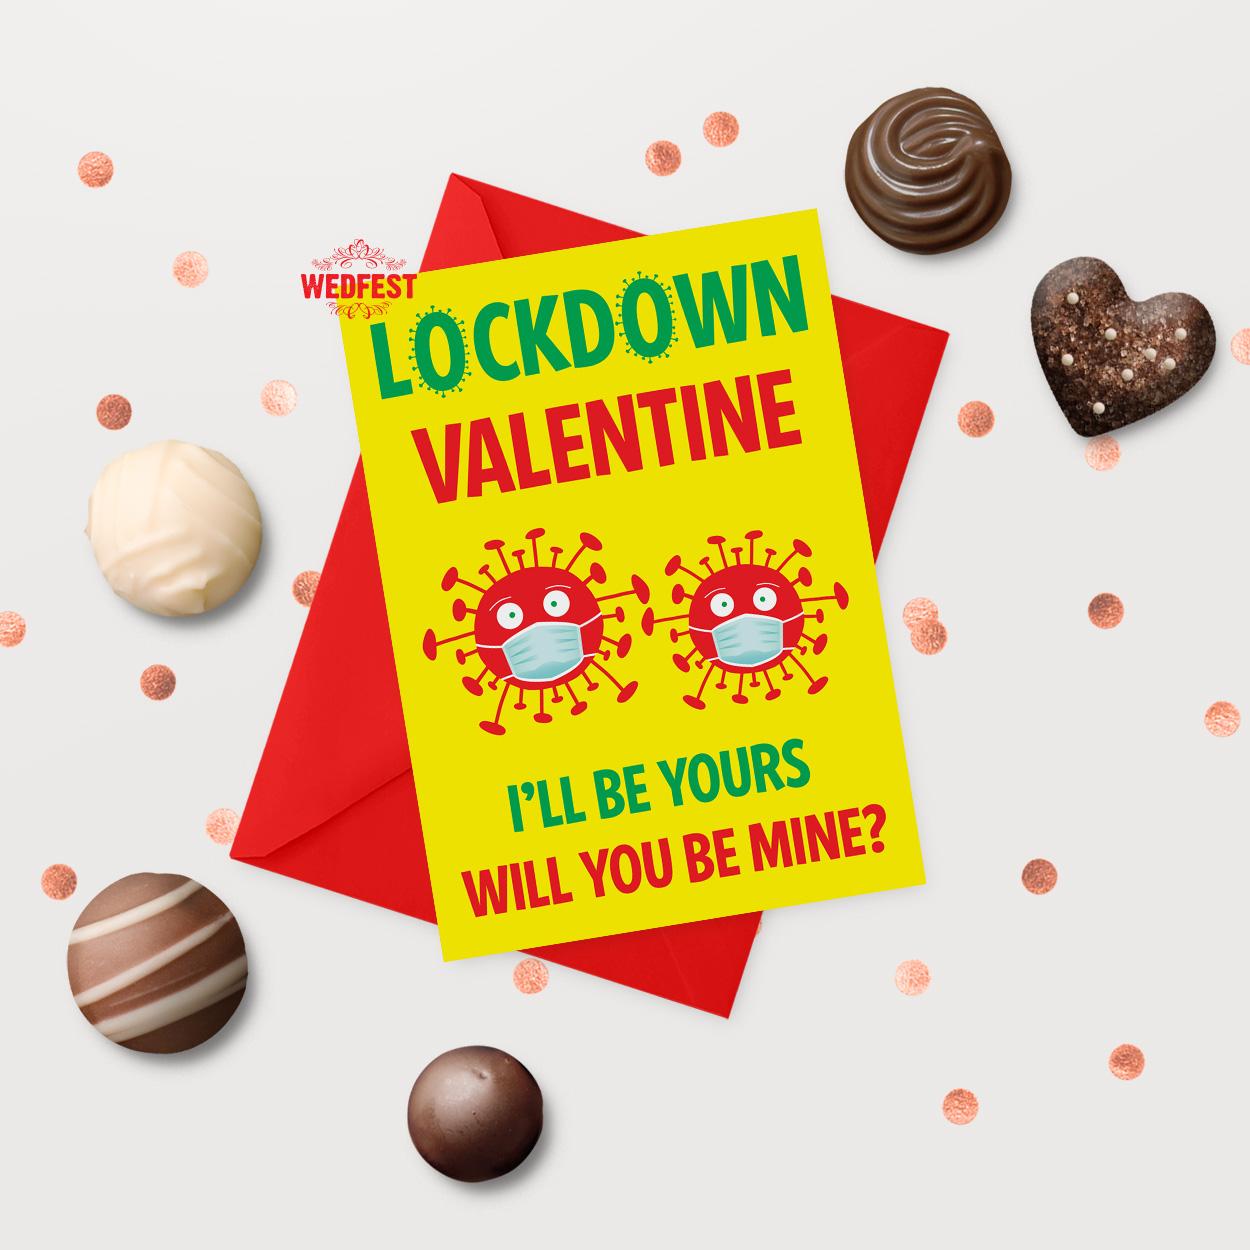 coronavirus covid lockdown valentines day card 2021